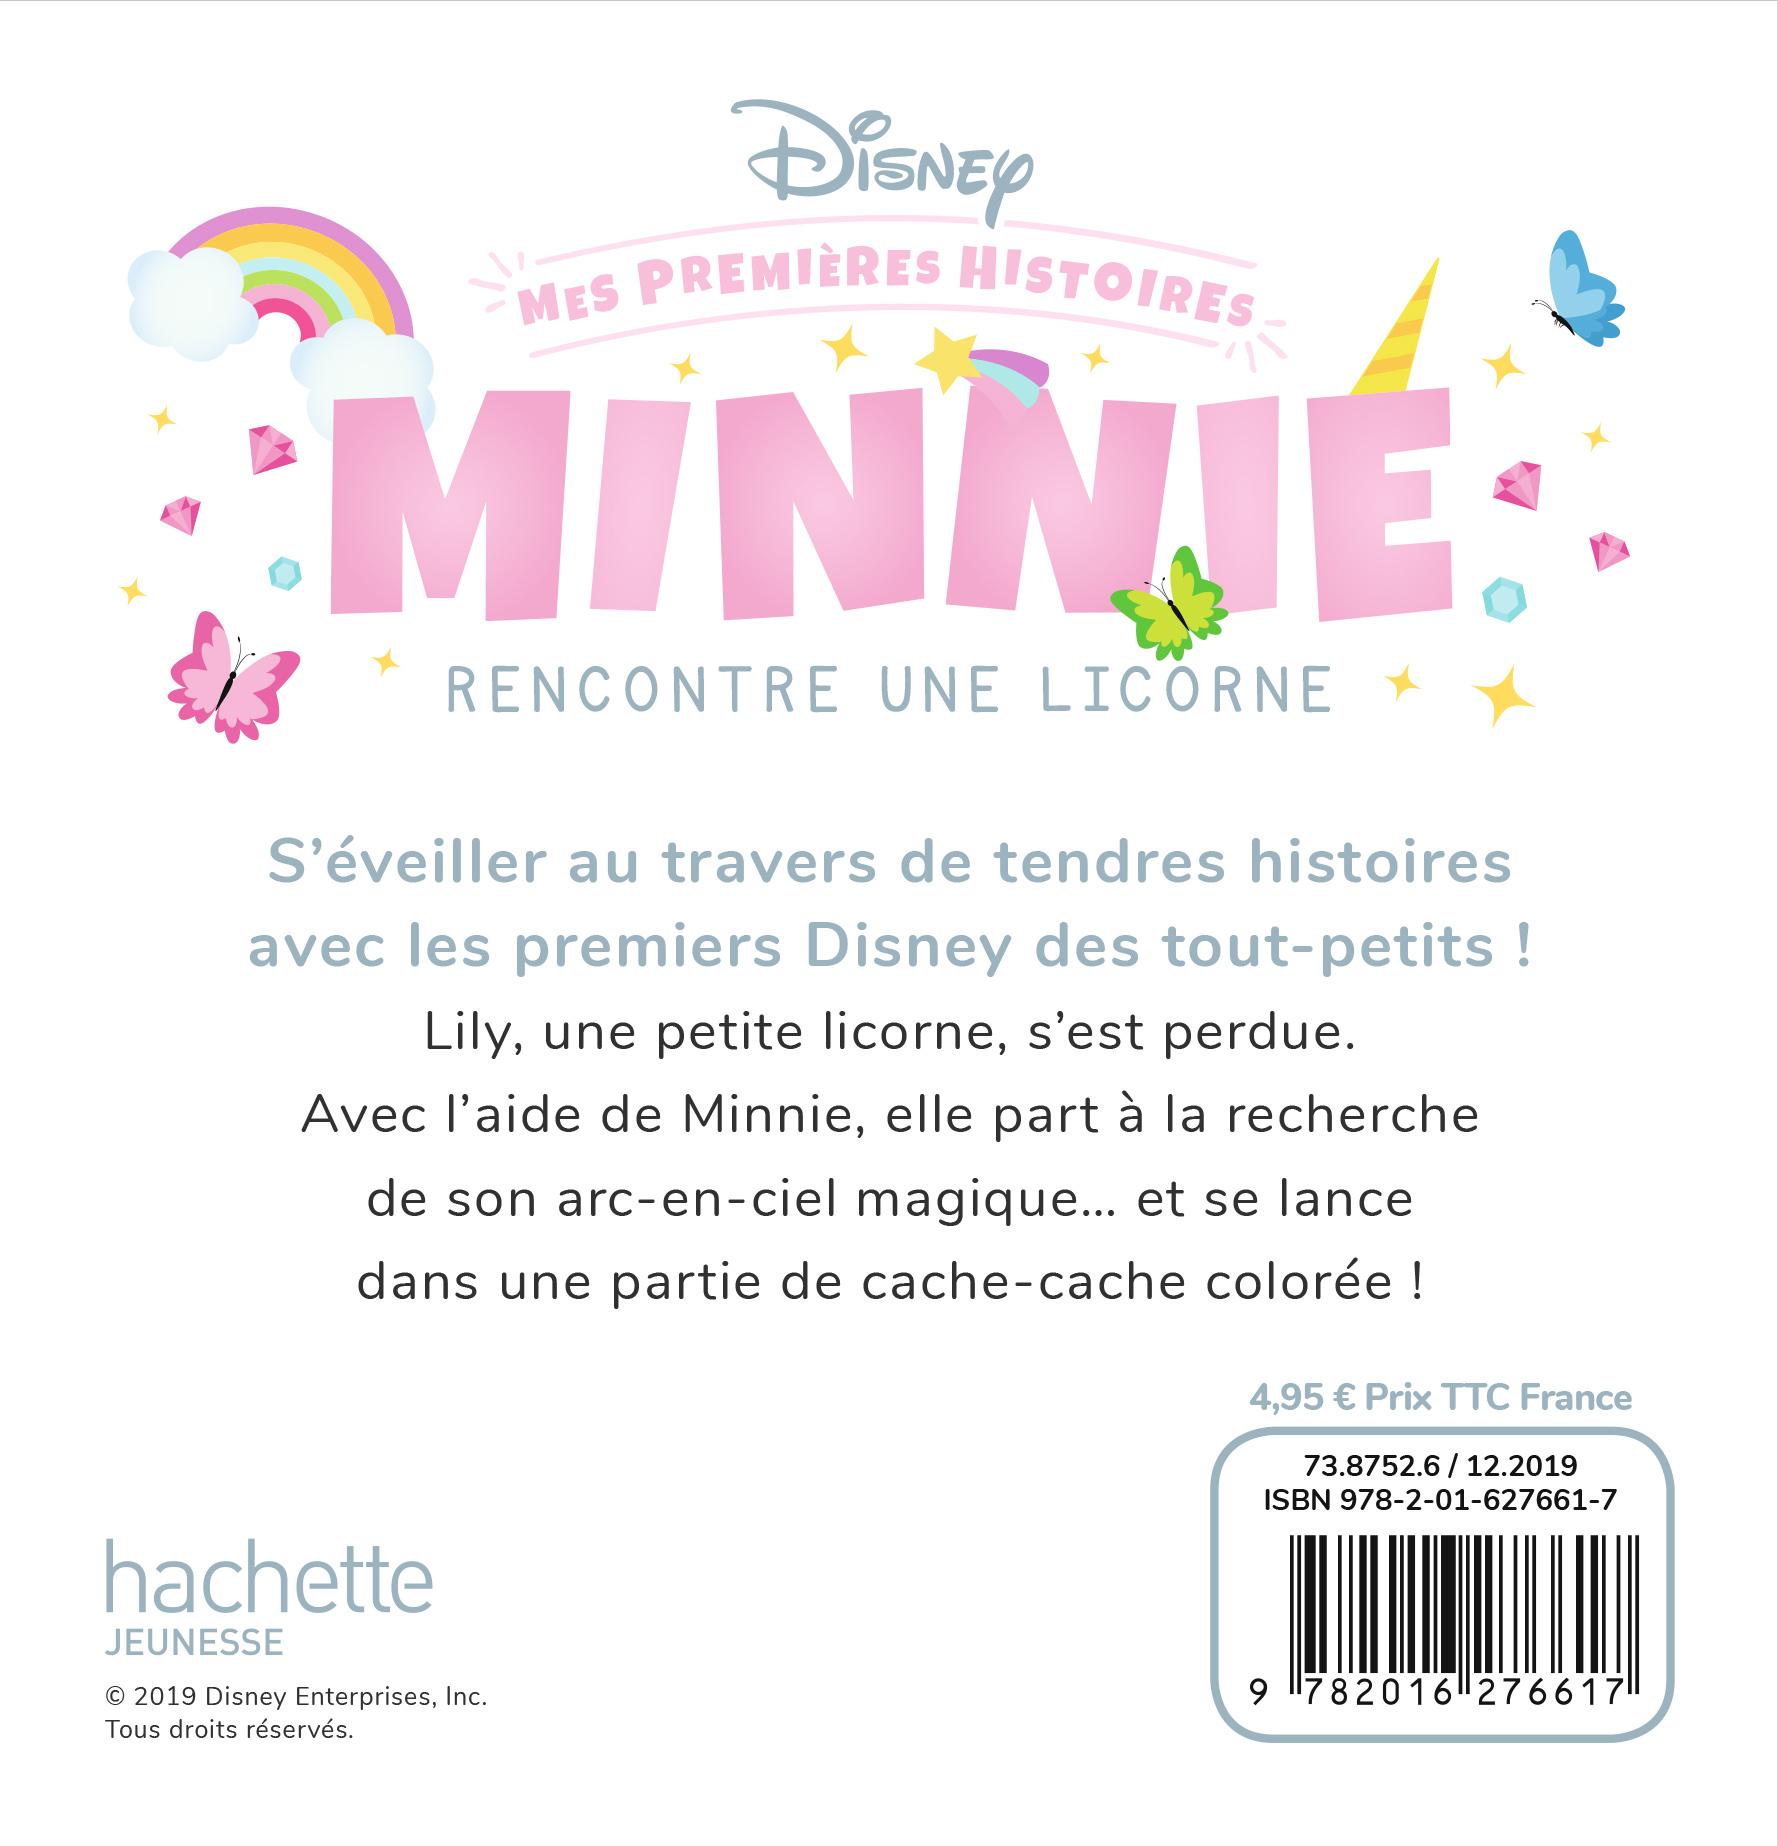 Disney Mes Premieres Histoires Minnie Rencontre Une Licorne